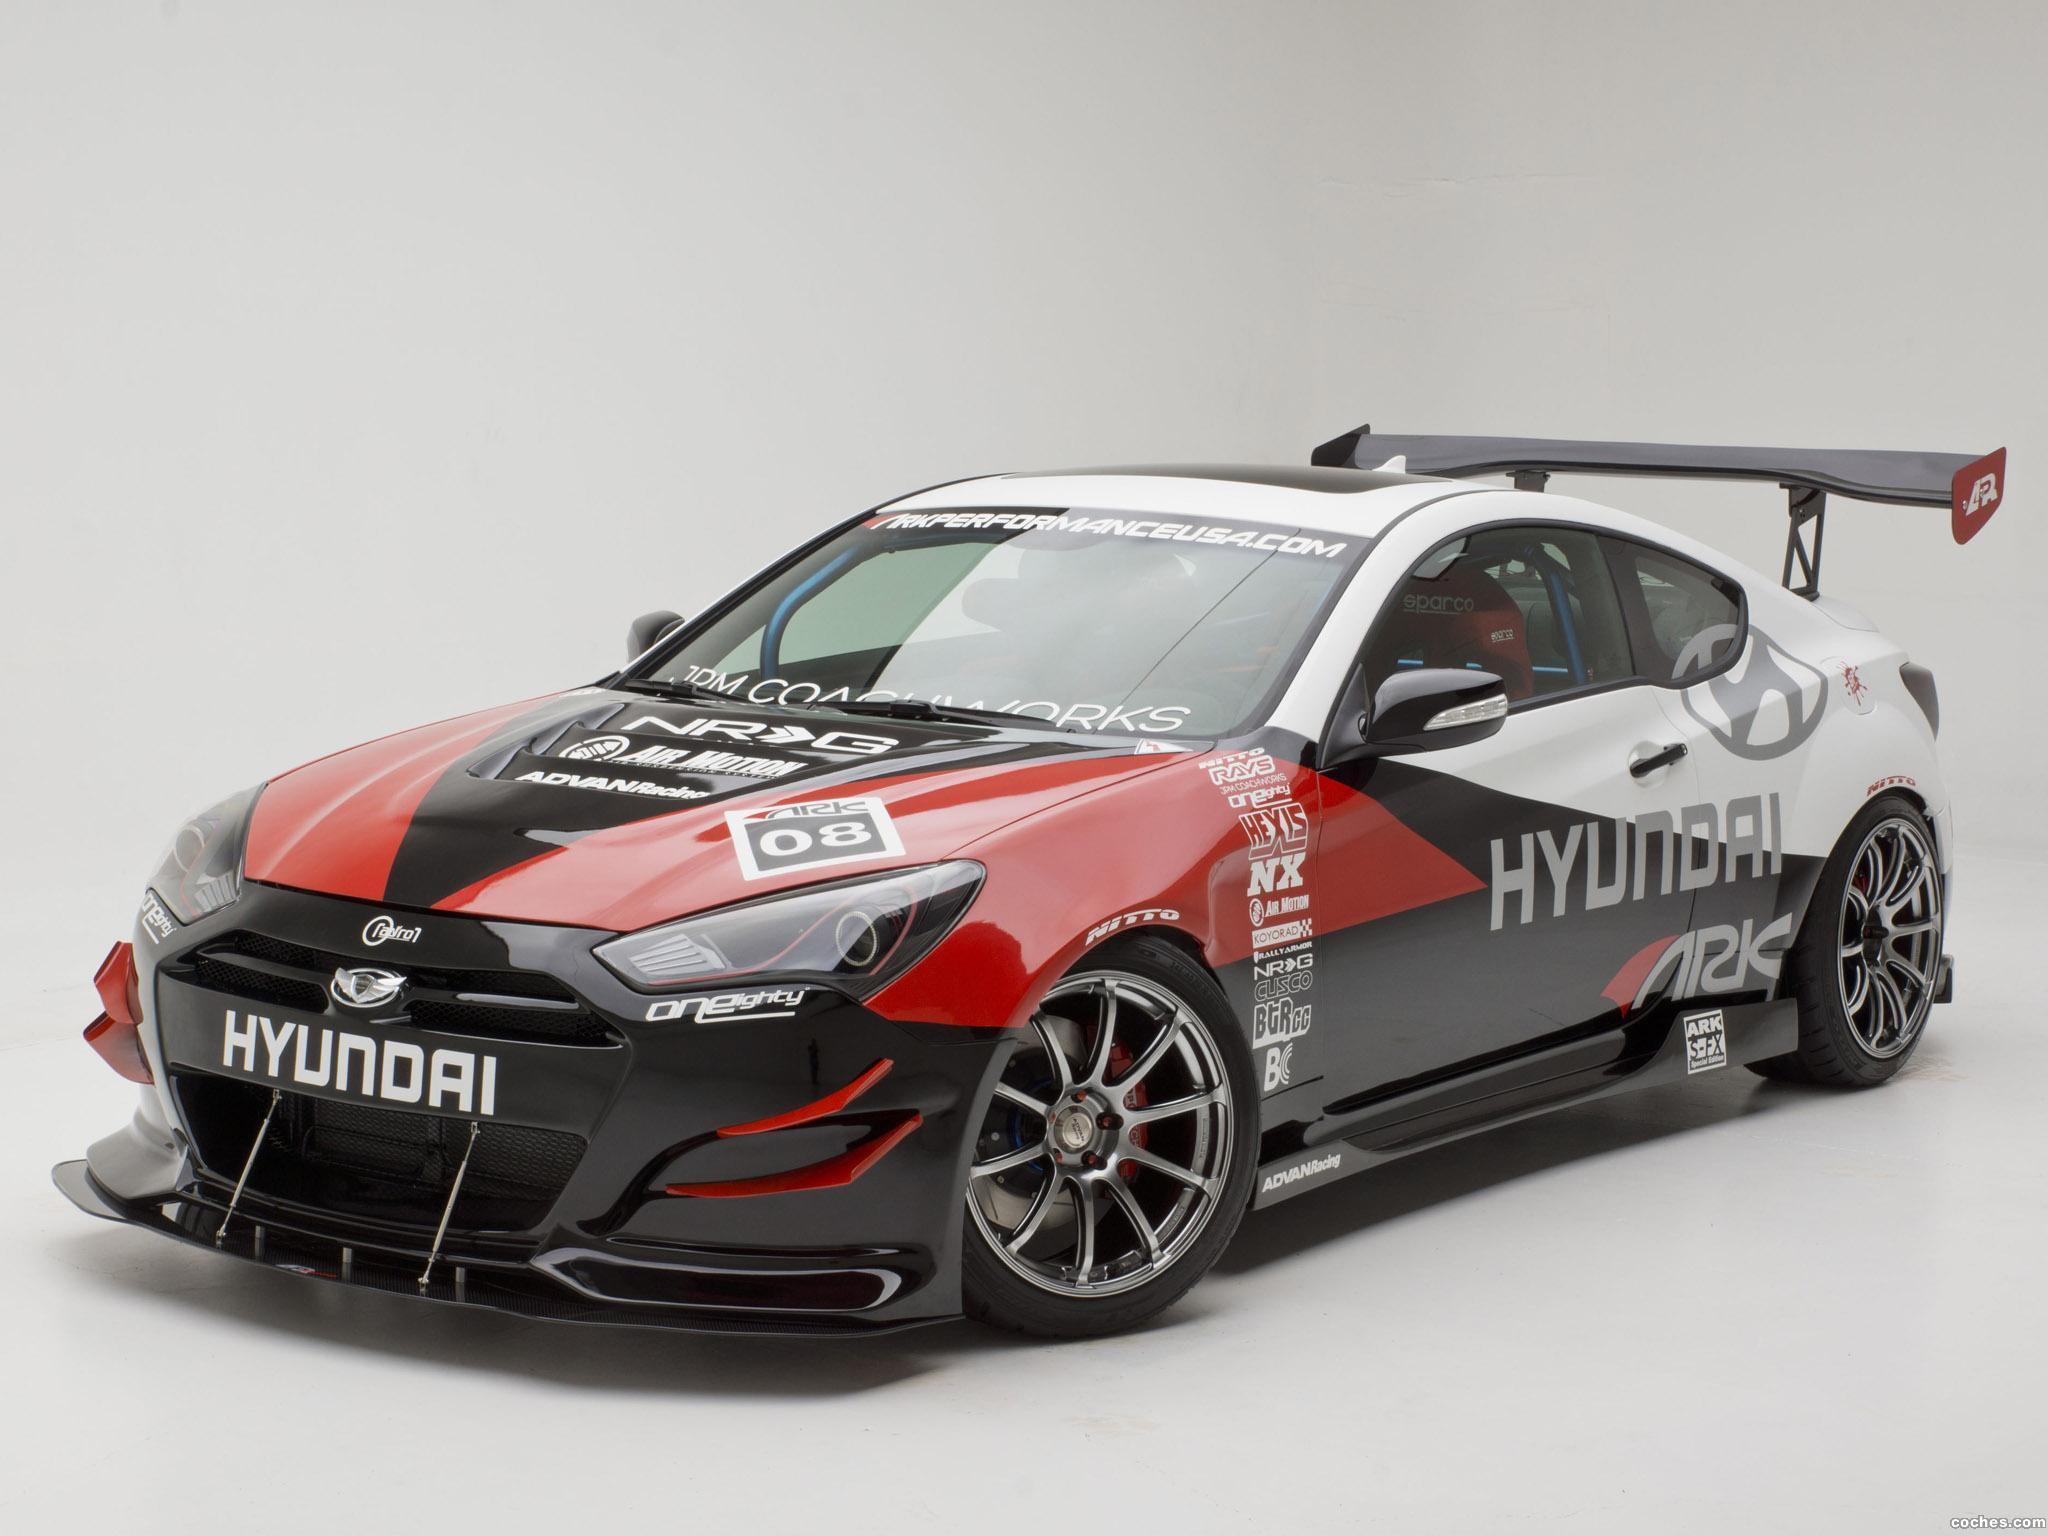 Foto 1 de Hyundai Genesis Coupe R-Spec Track Edition ARK Performance 2012